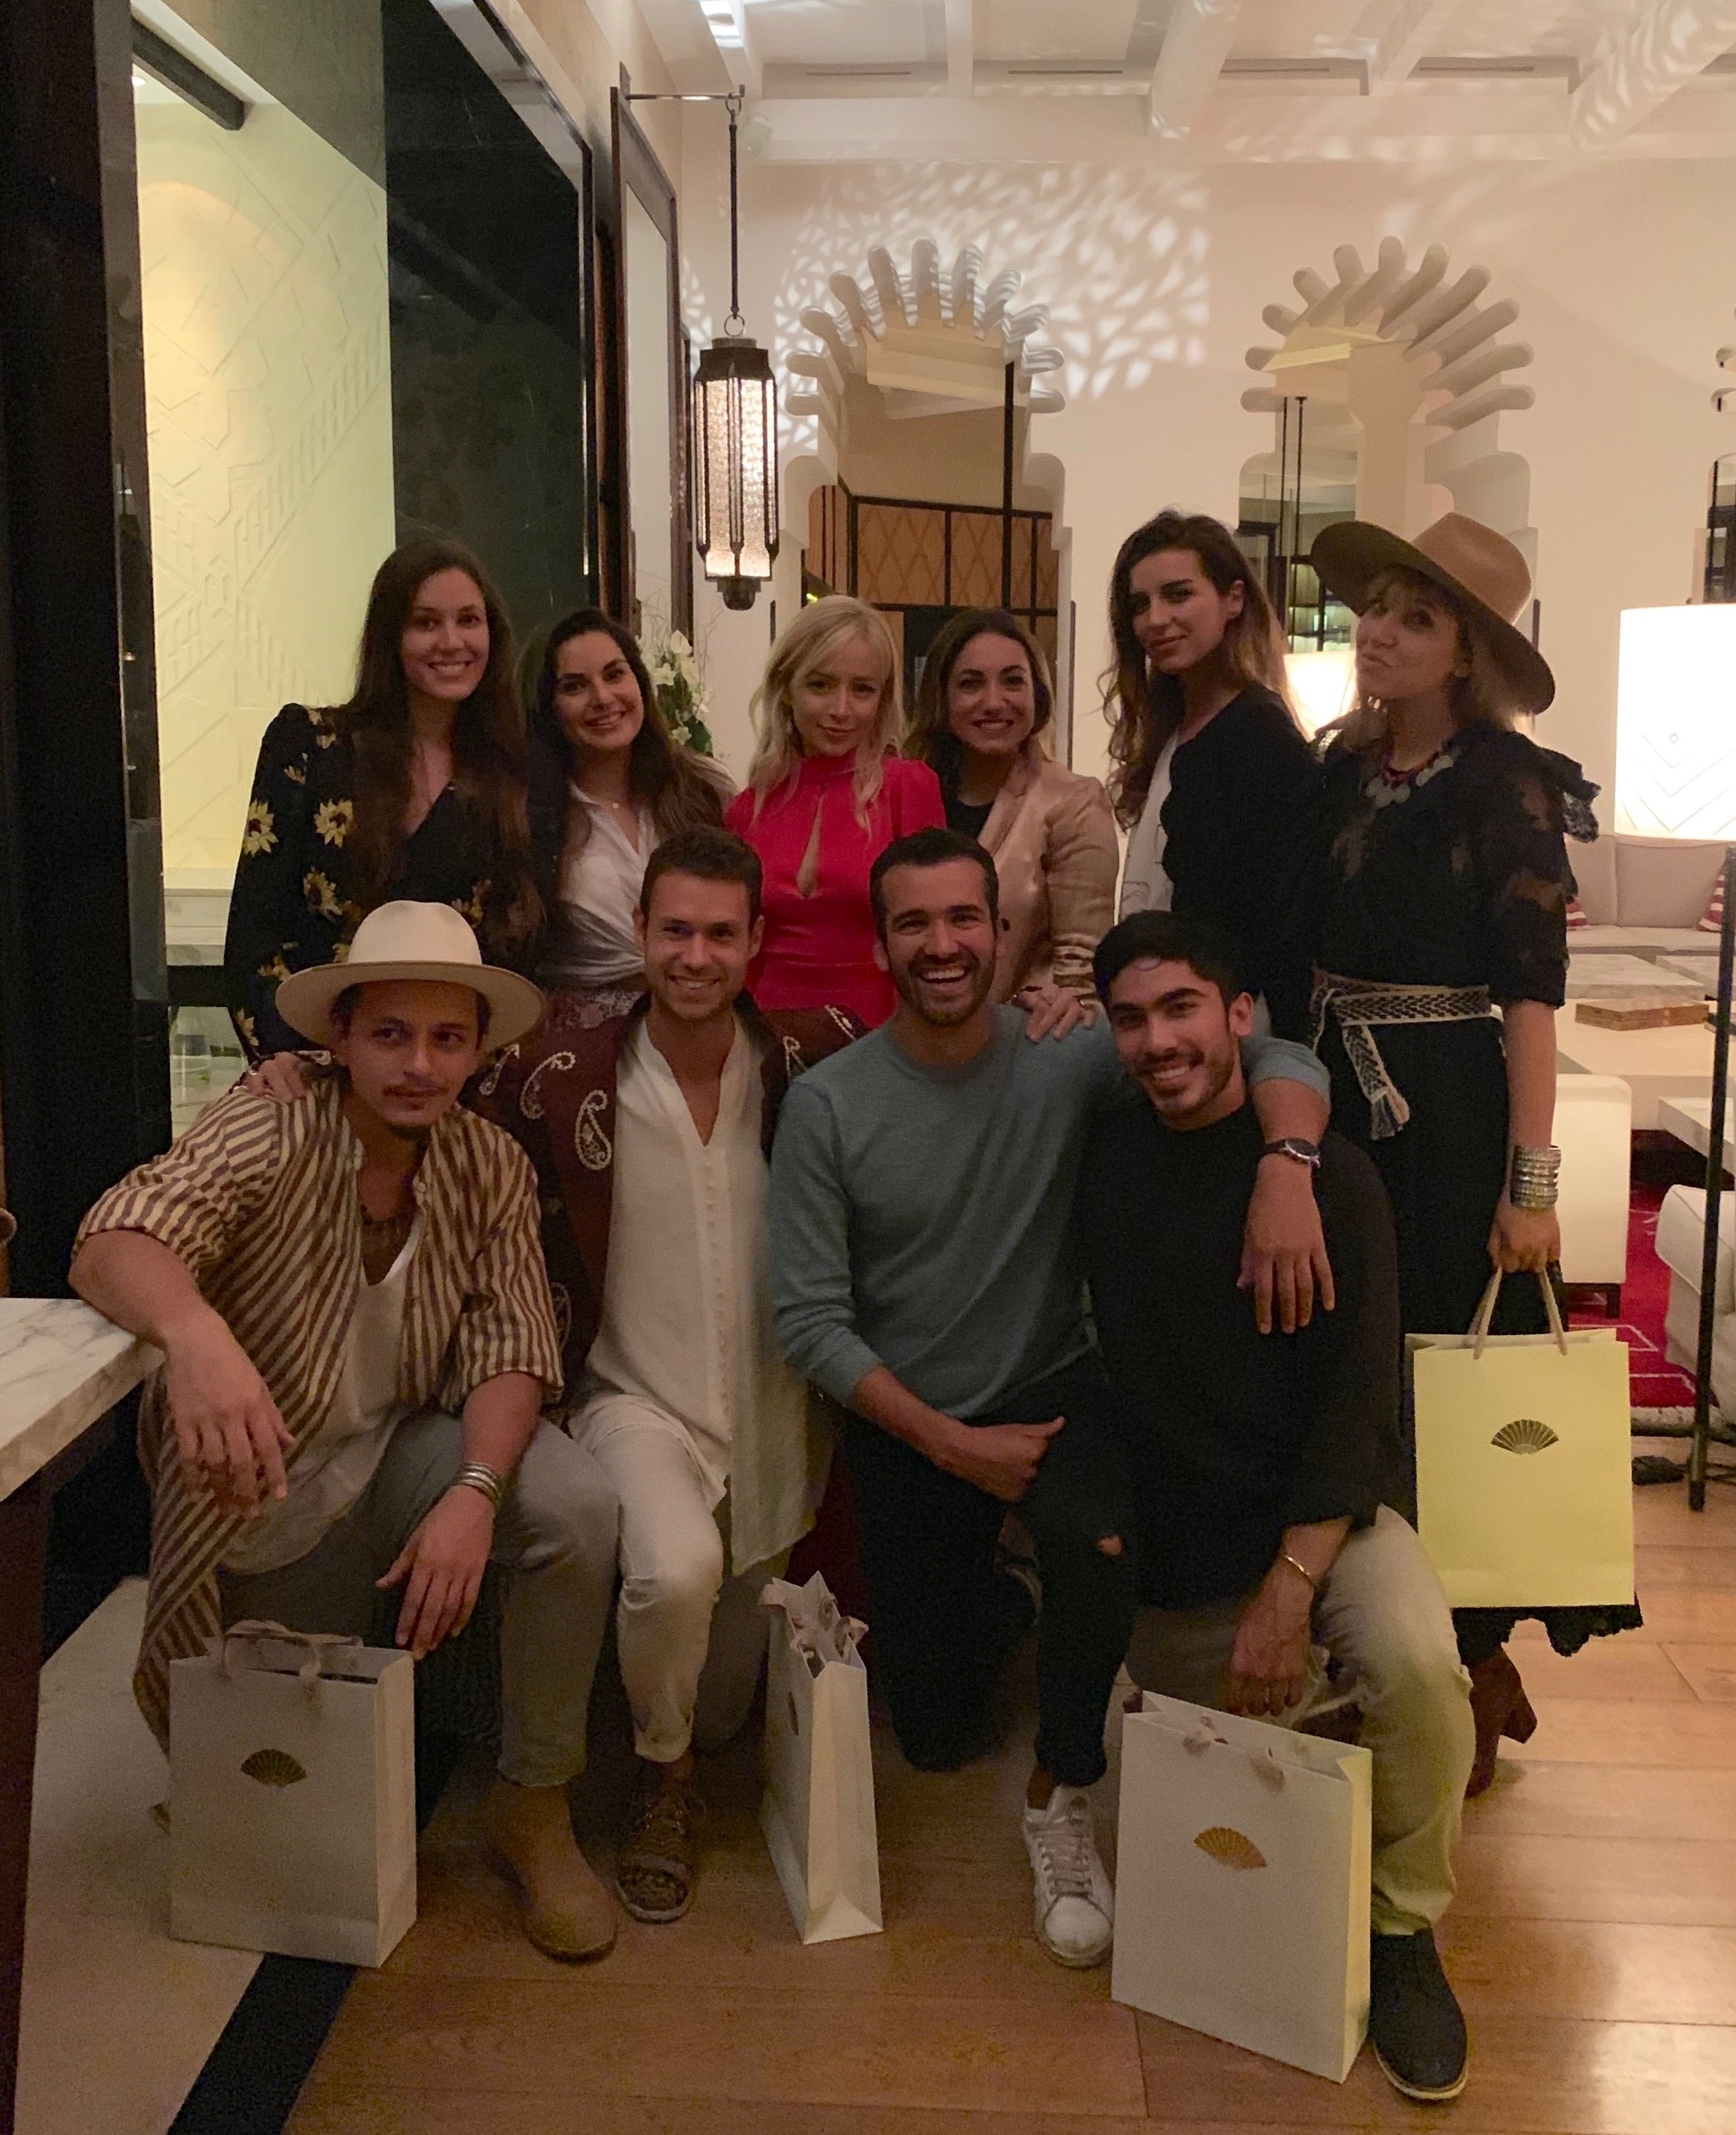 Clockwise from top left: Carina Otero, Raya Encheva, Aggie Lal, Carola Valls, Ketevan Giorgadze, Irina, Dakota Adan, Jonathan Kubben Quiñones, Jordan Taylor Wright, and Raresh at the Speakers' dinner at TIS Marrakech.